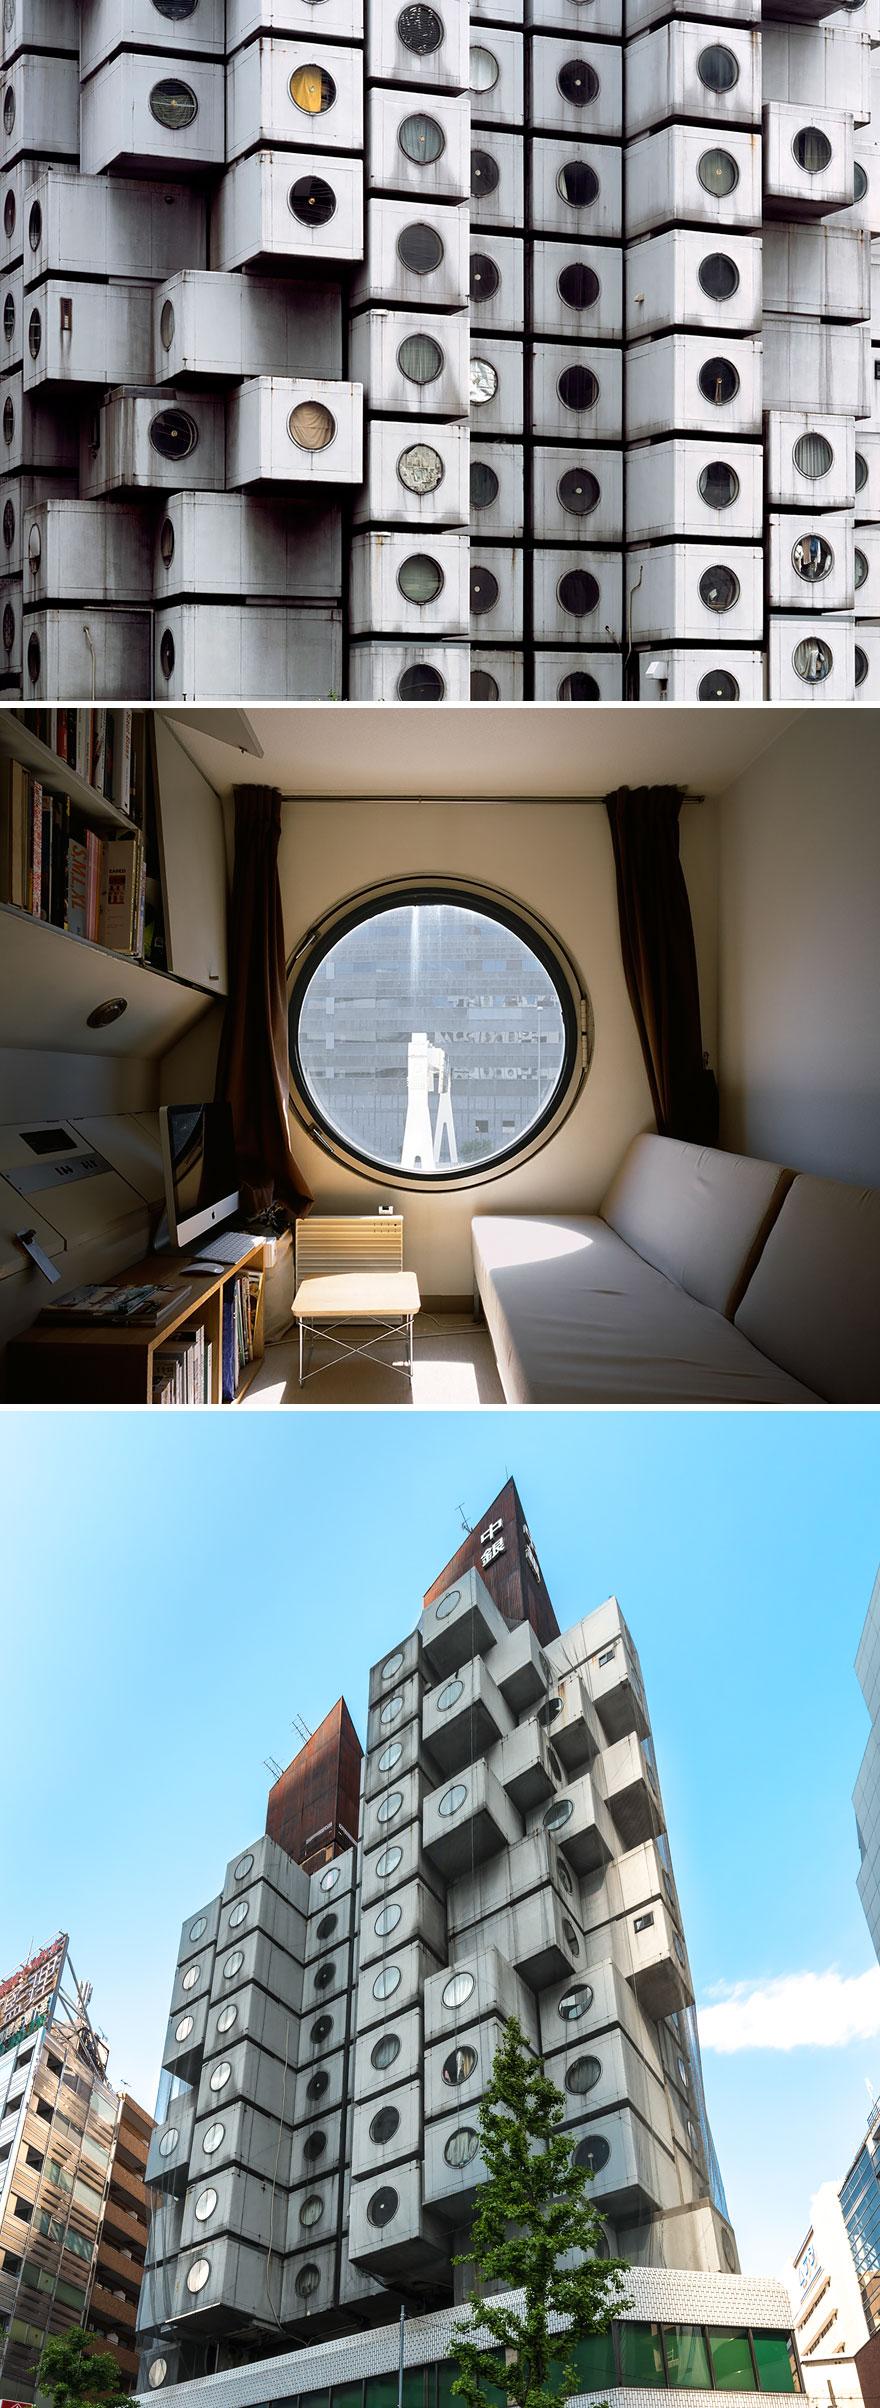 amazing-modern-japanese-architecture-101-57e26f027a8a6__880